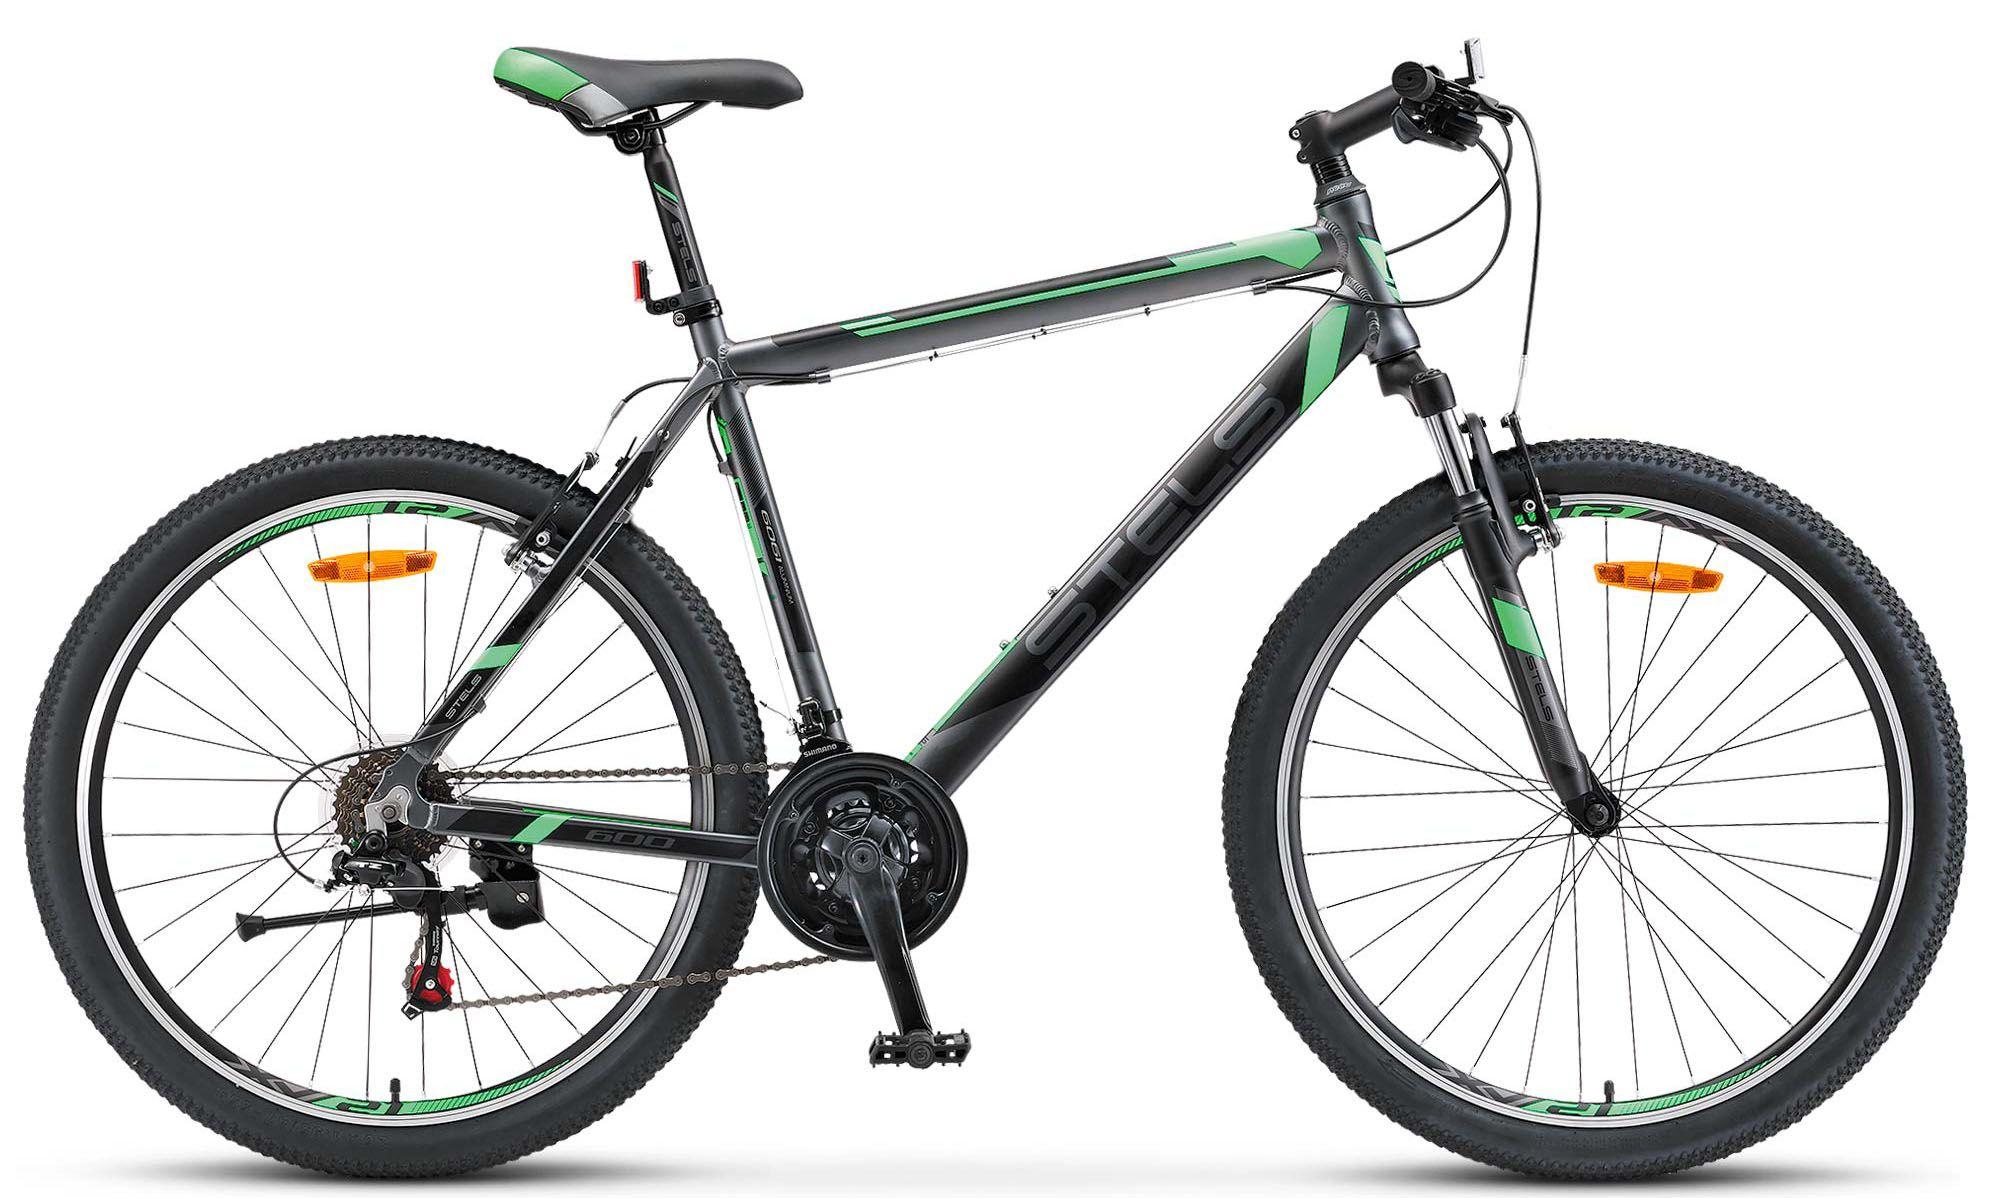 Велосипед Stels Navigator 600 V 26 (V020) 2018 велосипед stels powerkid 12 boy v020 2018